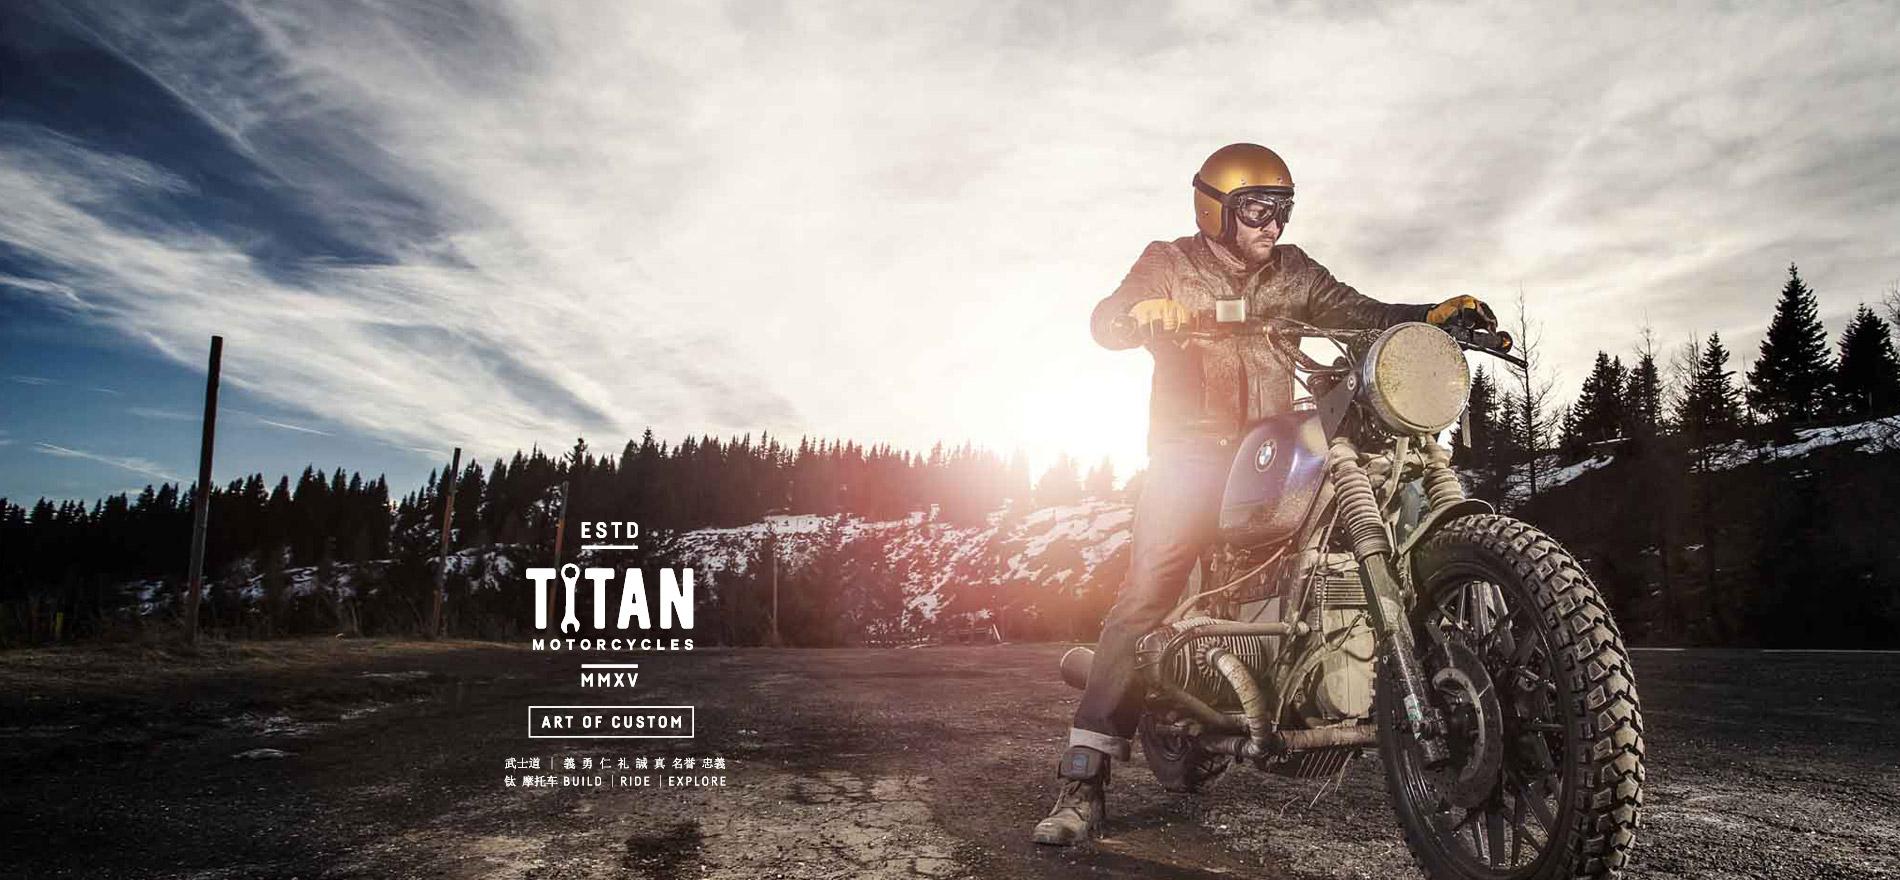 TITAN-Motorcycle-Co-Graz-Austria-Lead-Build-GearHead-PetrolHead-Michael-Siebenhofer Custom BMW Umbau Cafe Racer Graz